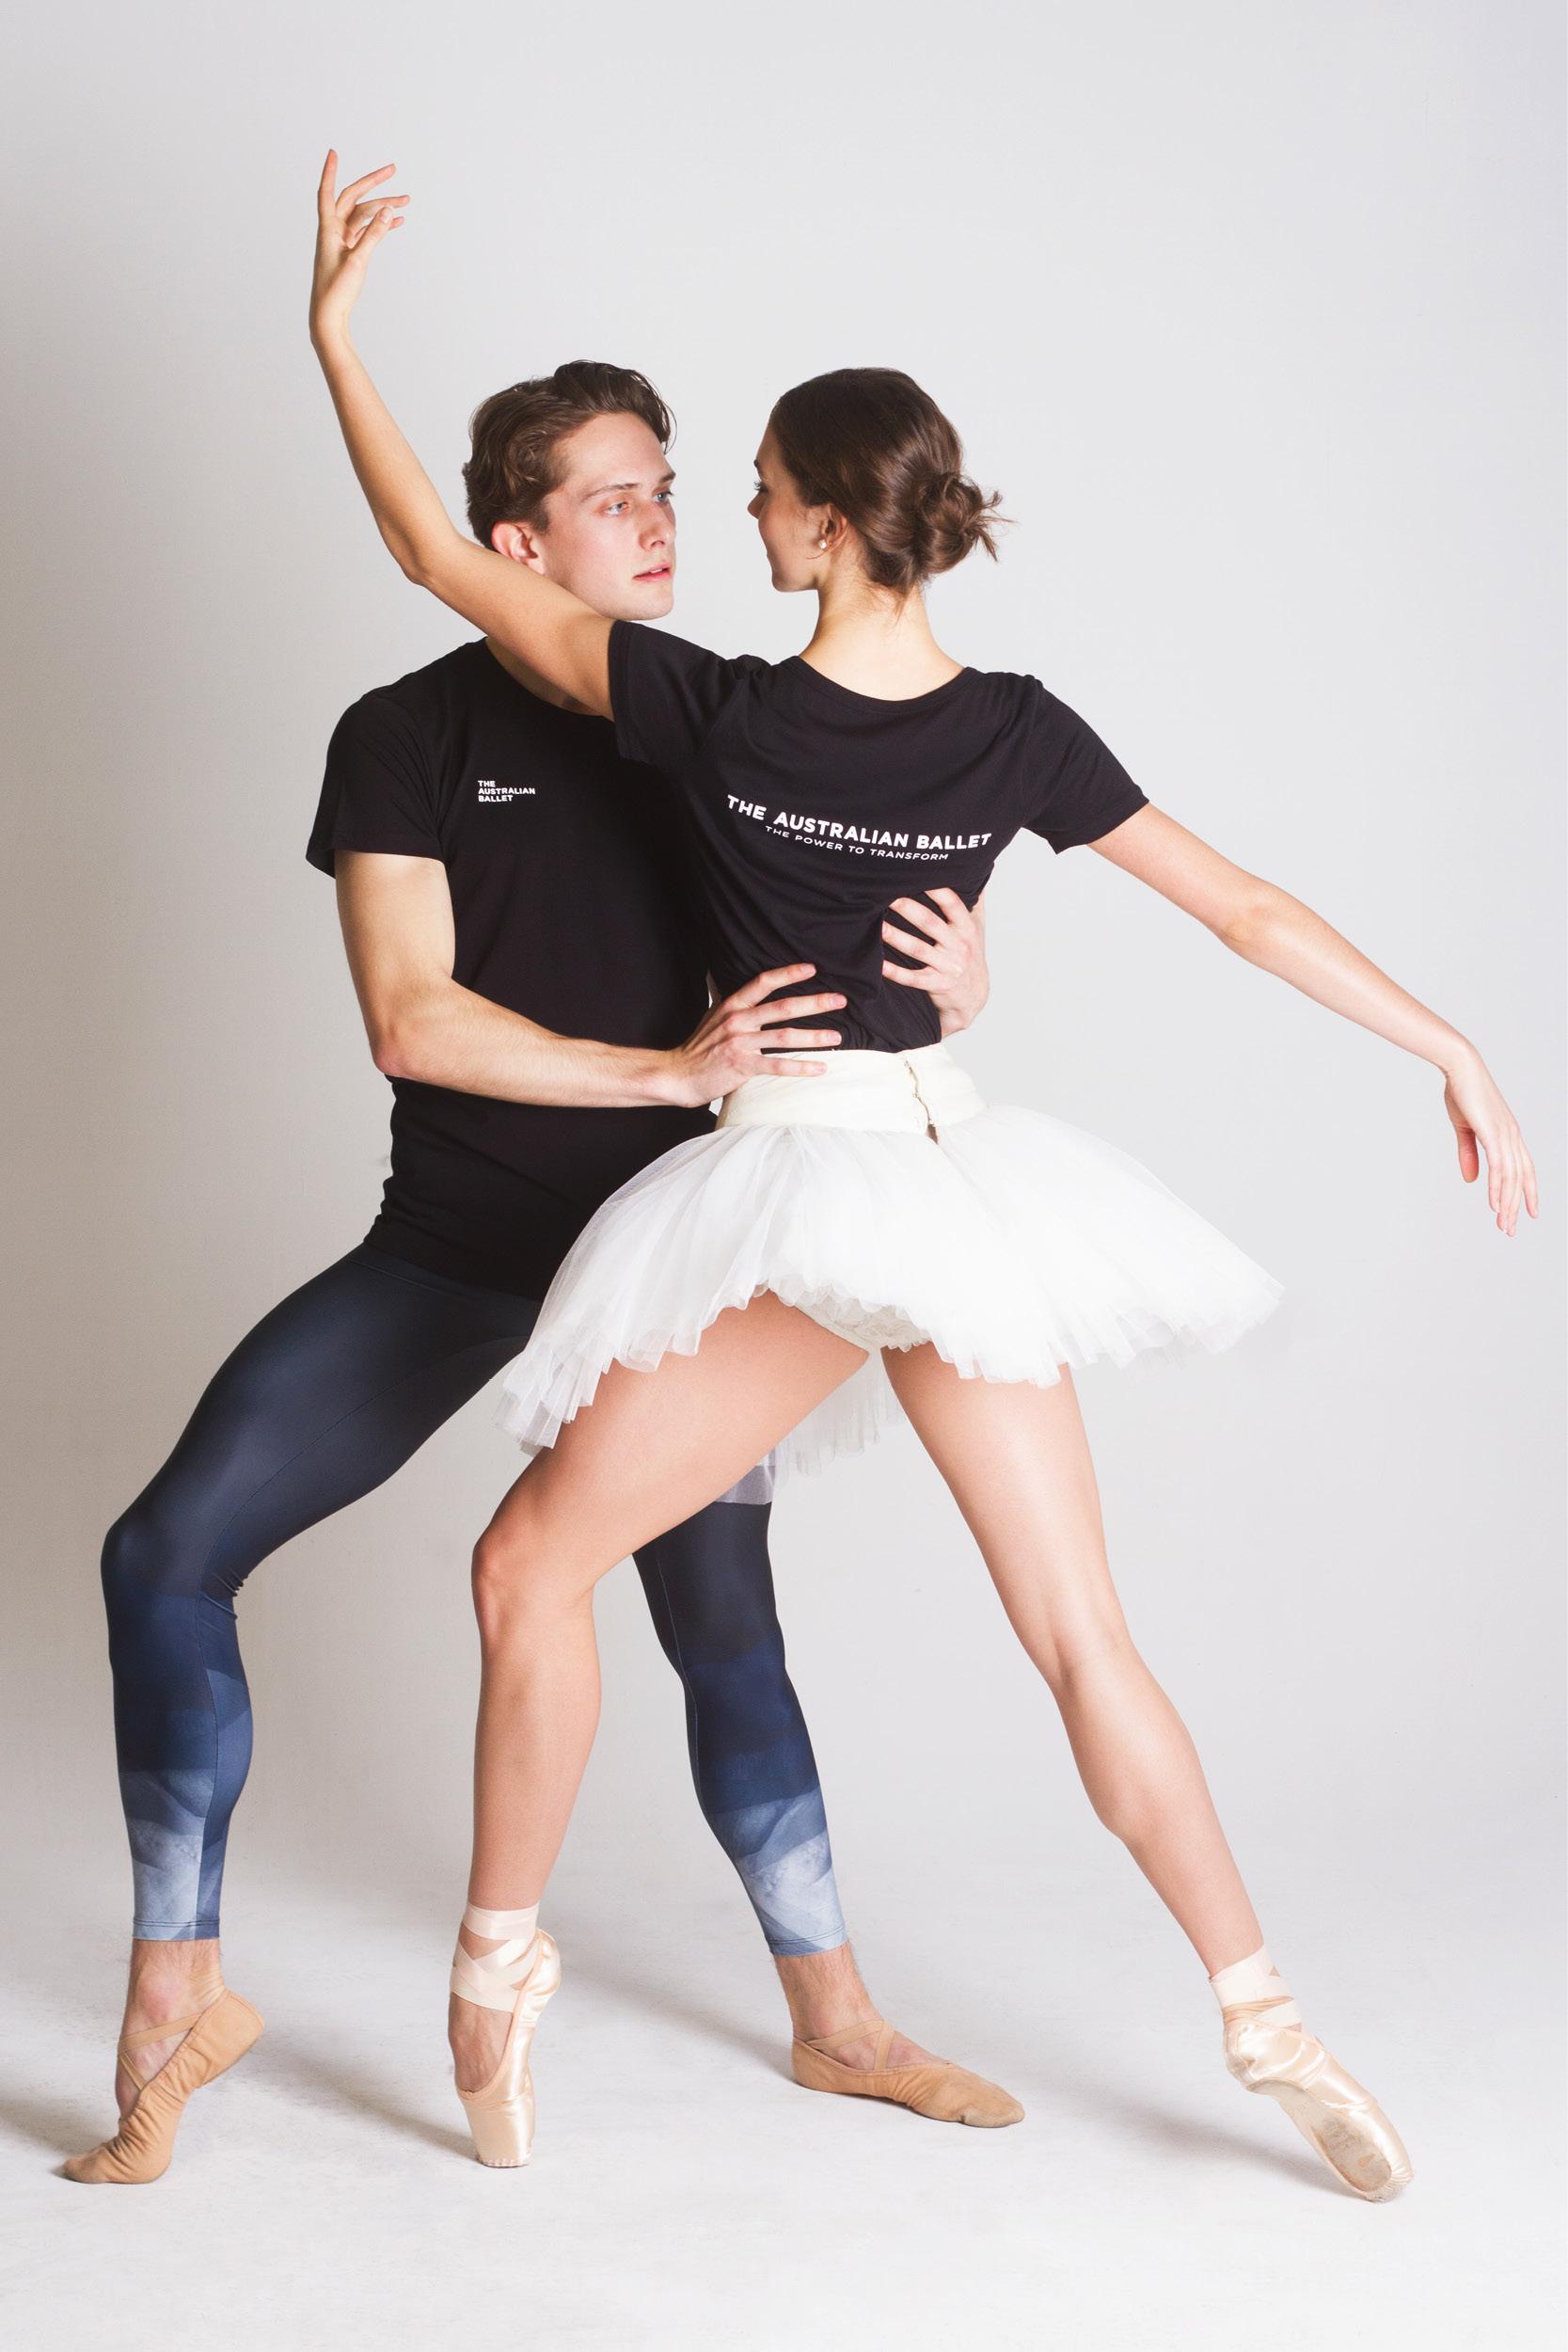 The Australian Ballet T Shirt The Australian Ballet